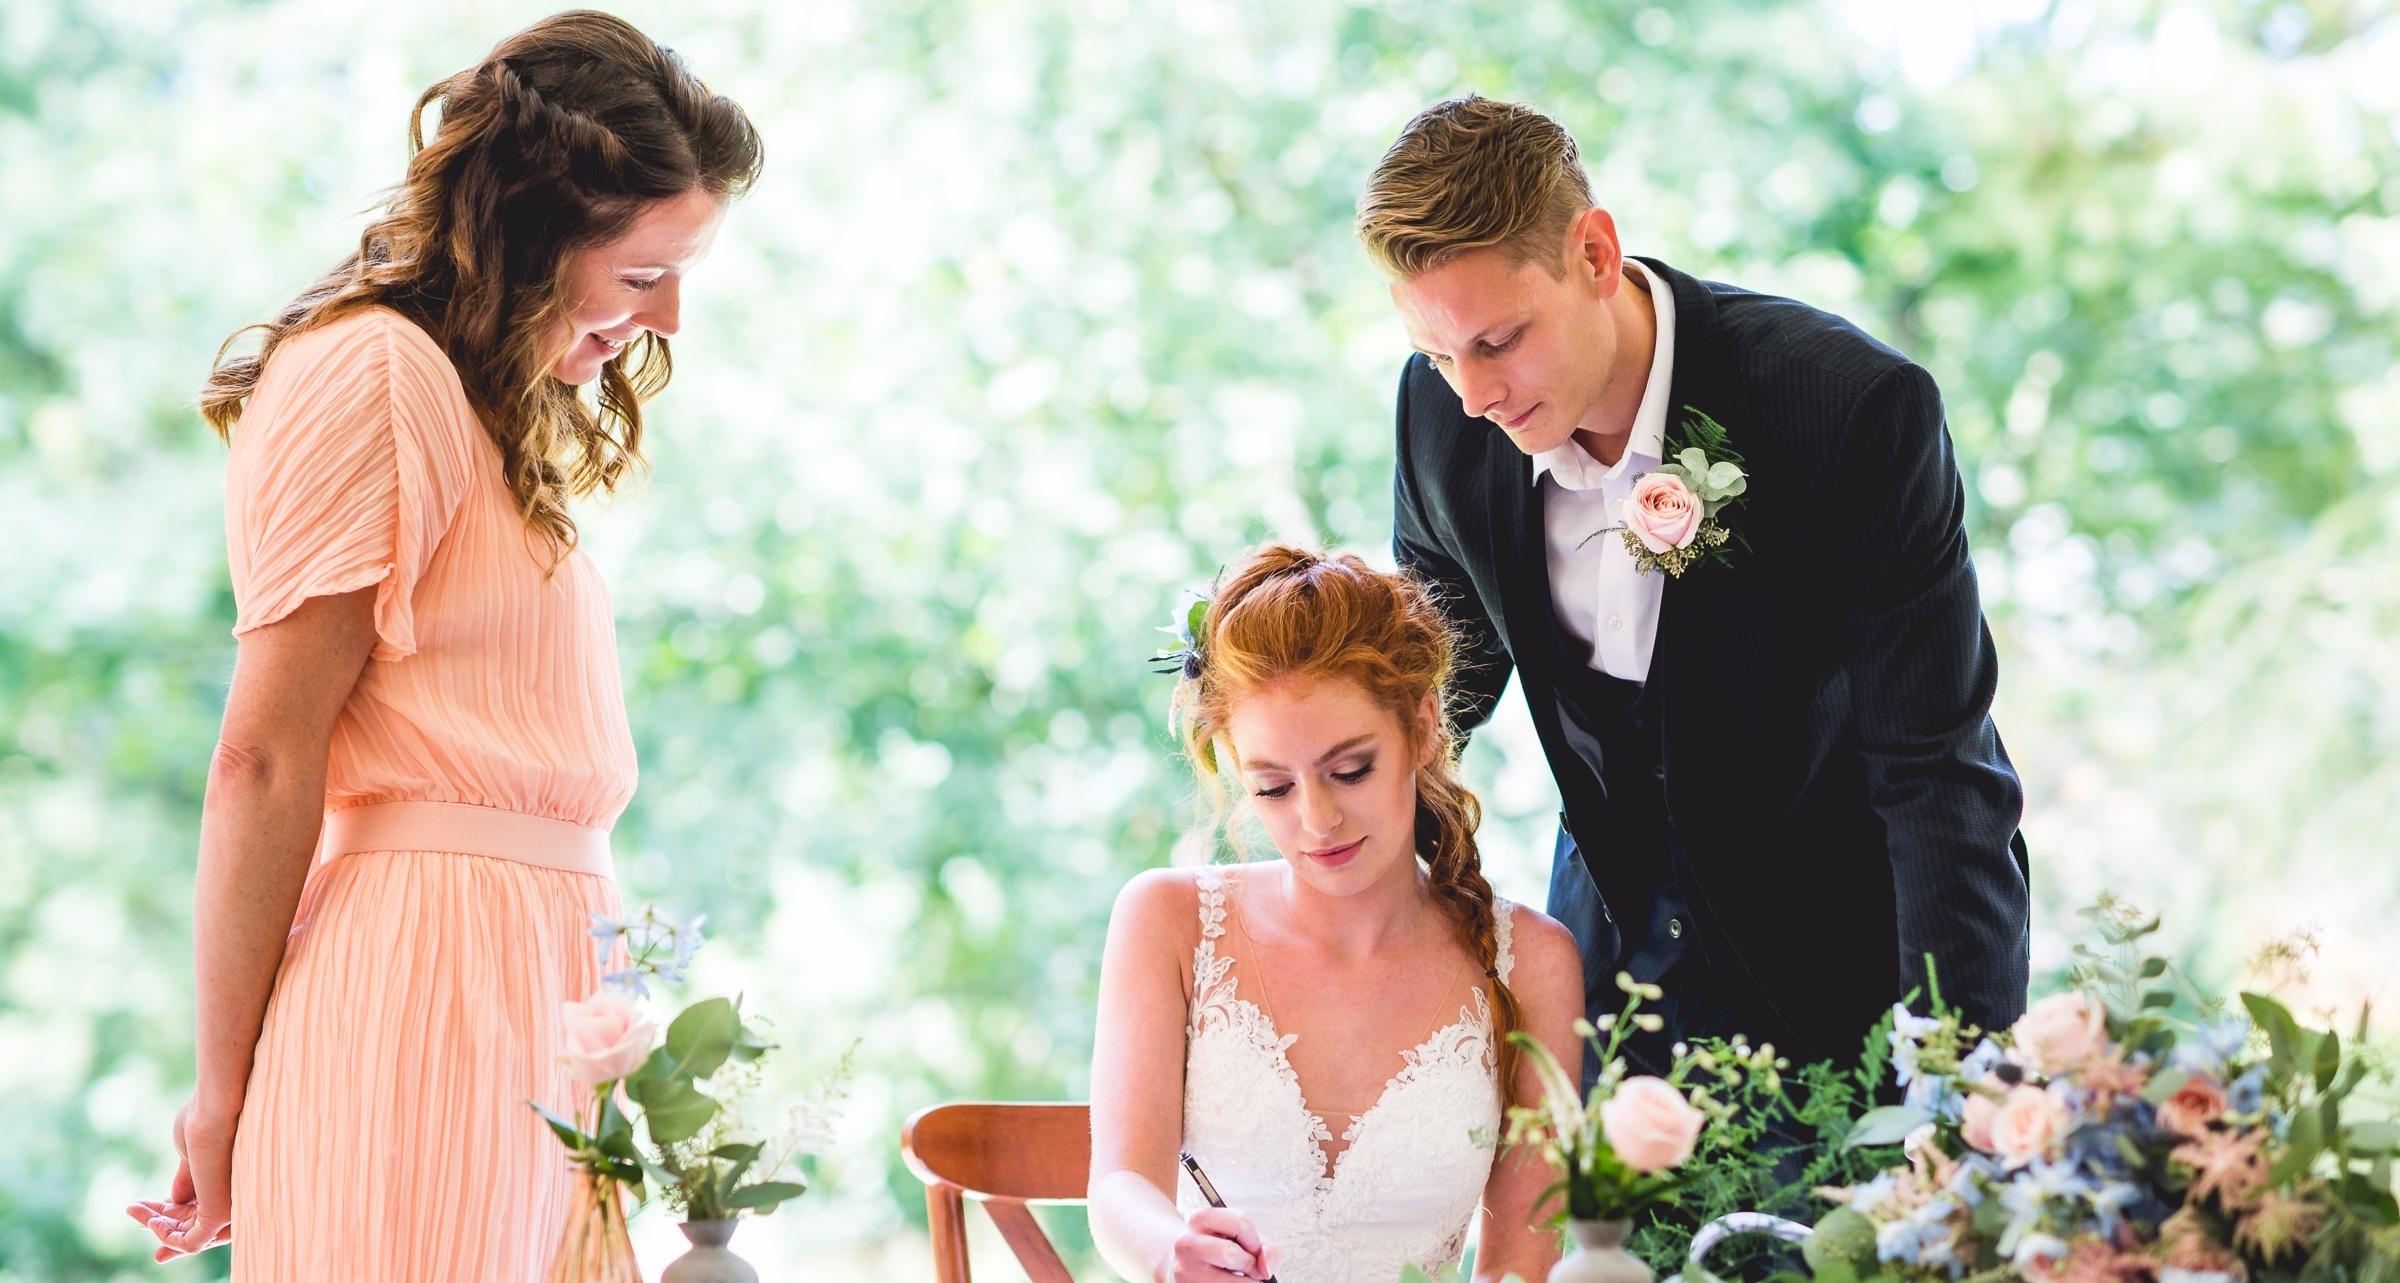 woodlands_wedding_160817-1230.jpg